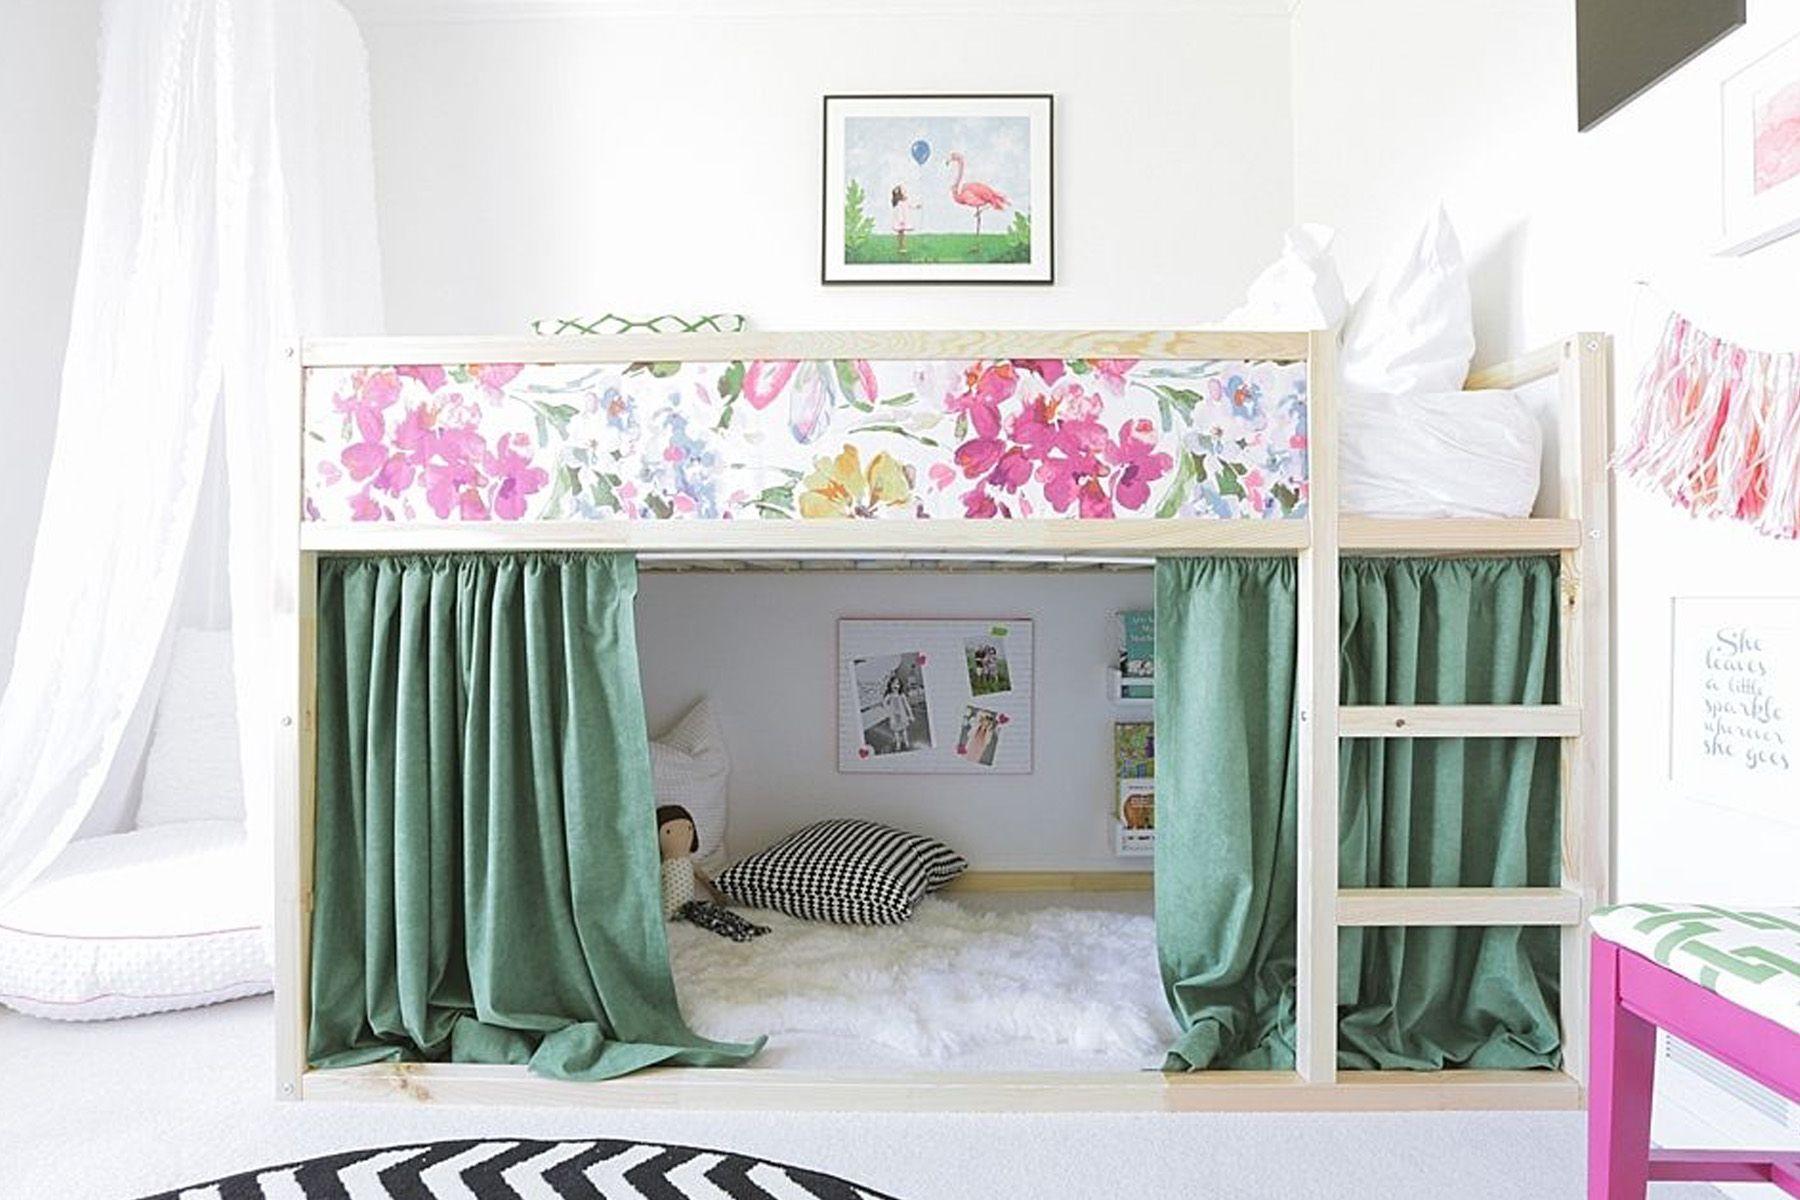 15 Best Ikea Bed Hacks How To Upgrade Your Ikea Bed